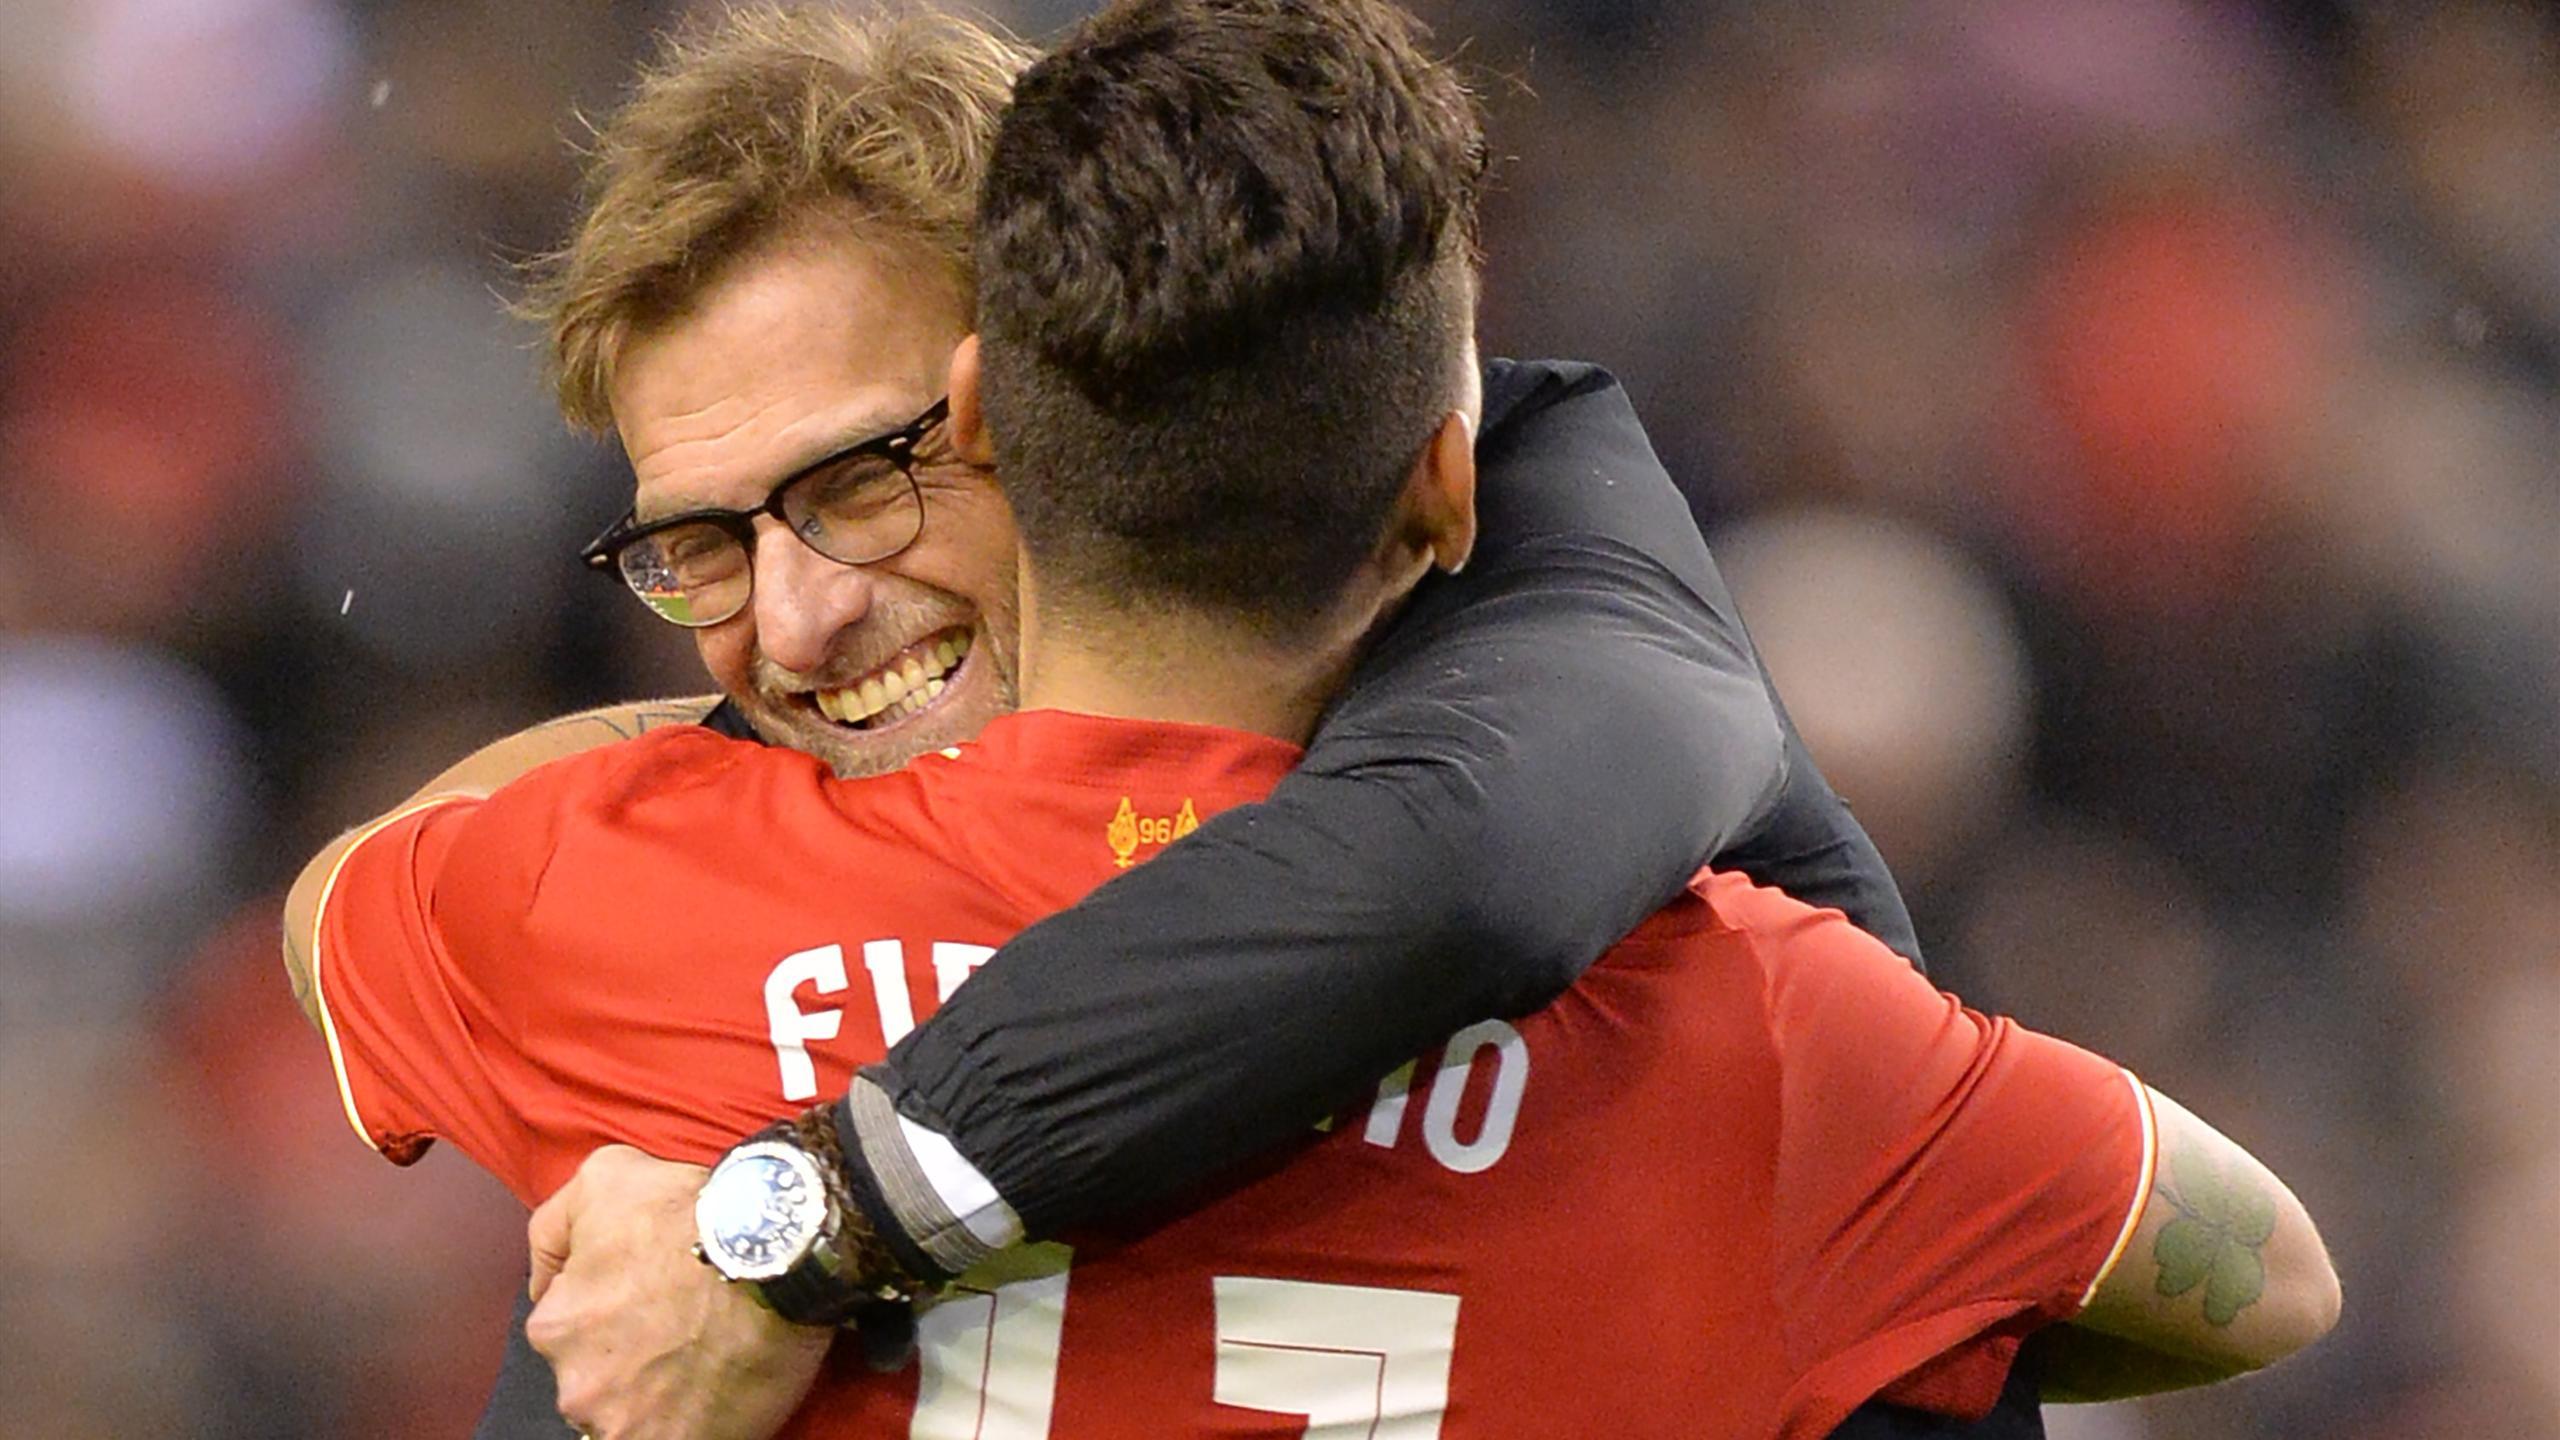 Jürgen Klopp et Roberto Firmino fêtent la victoire de Liverpool